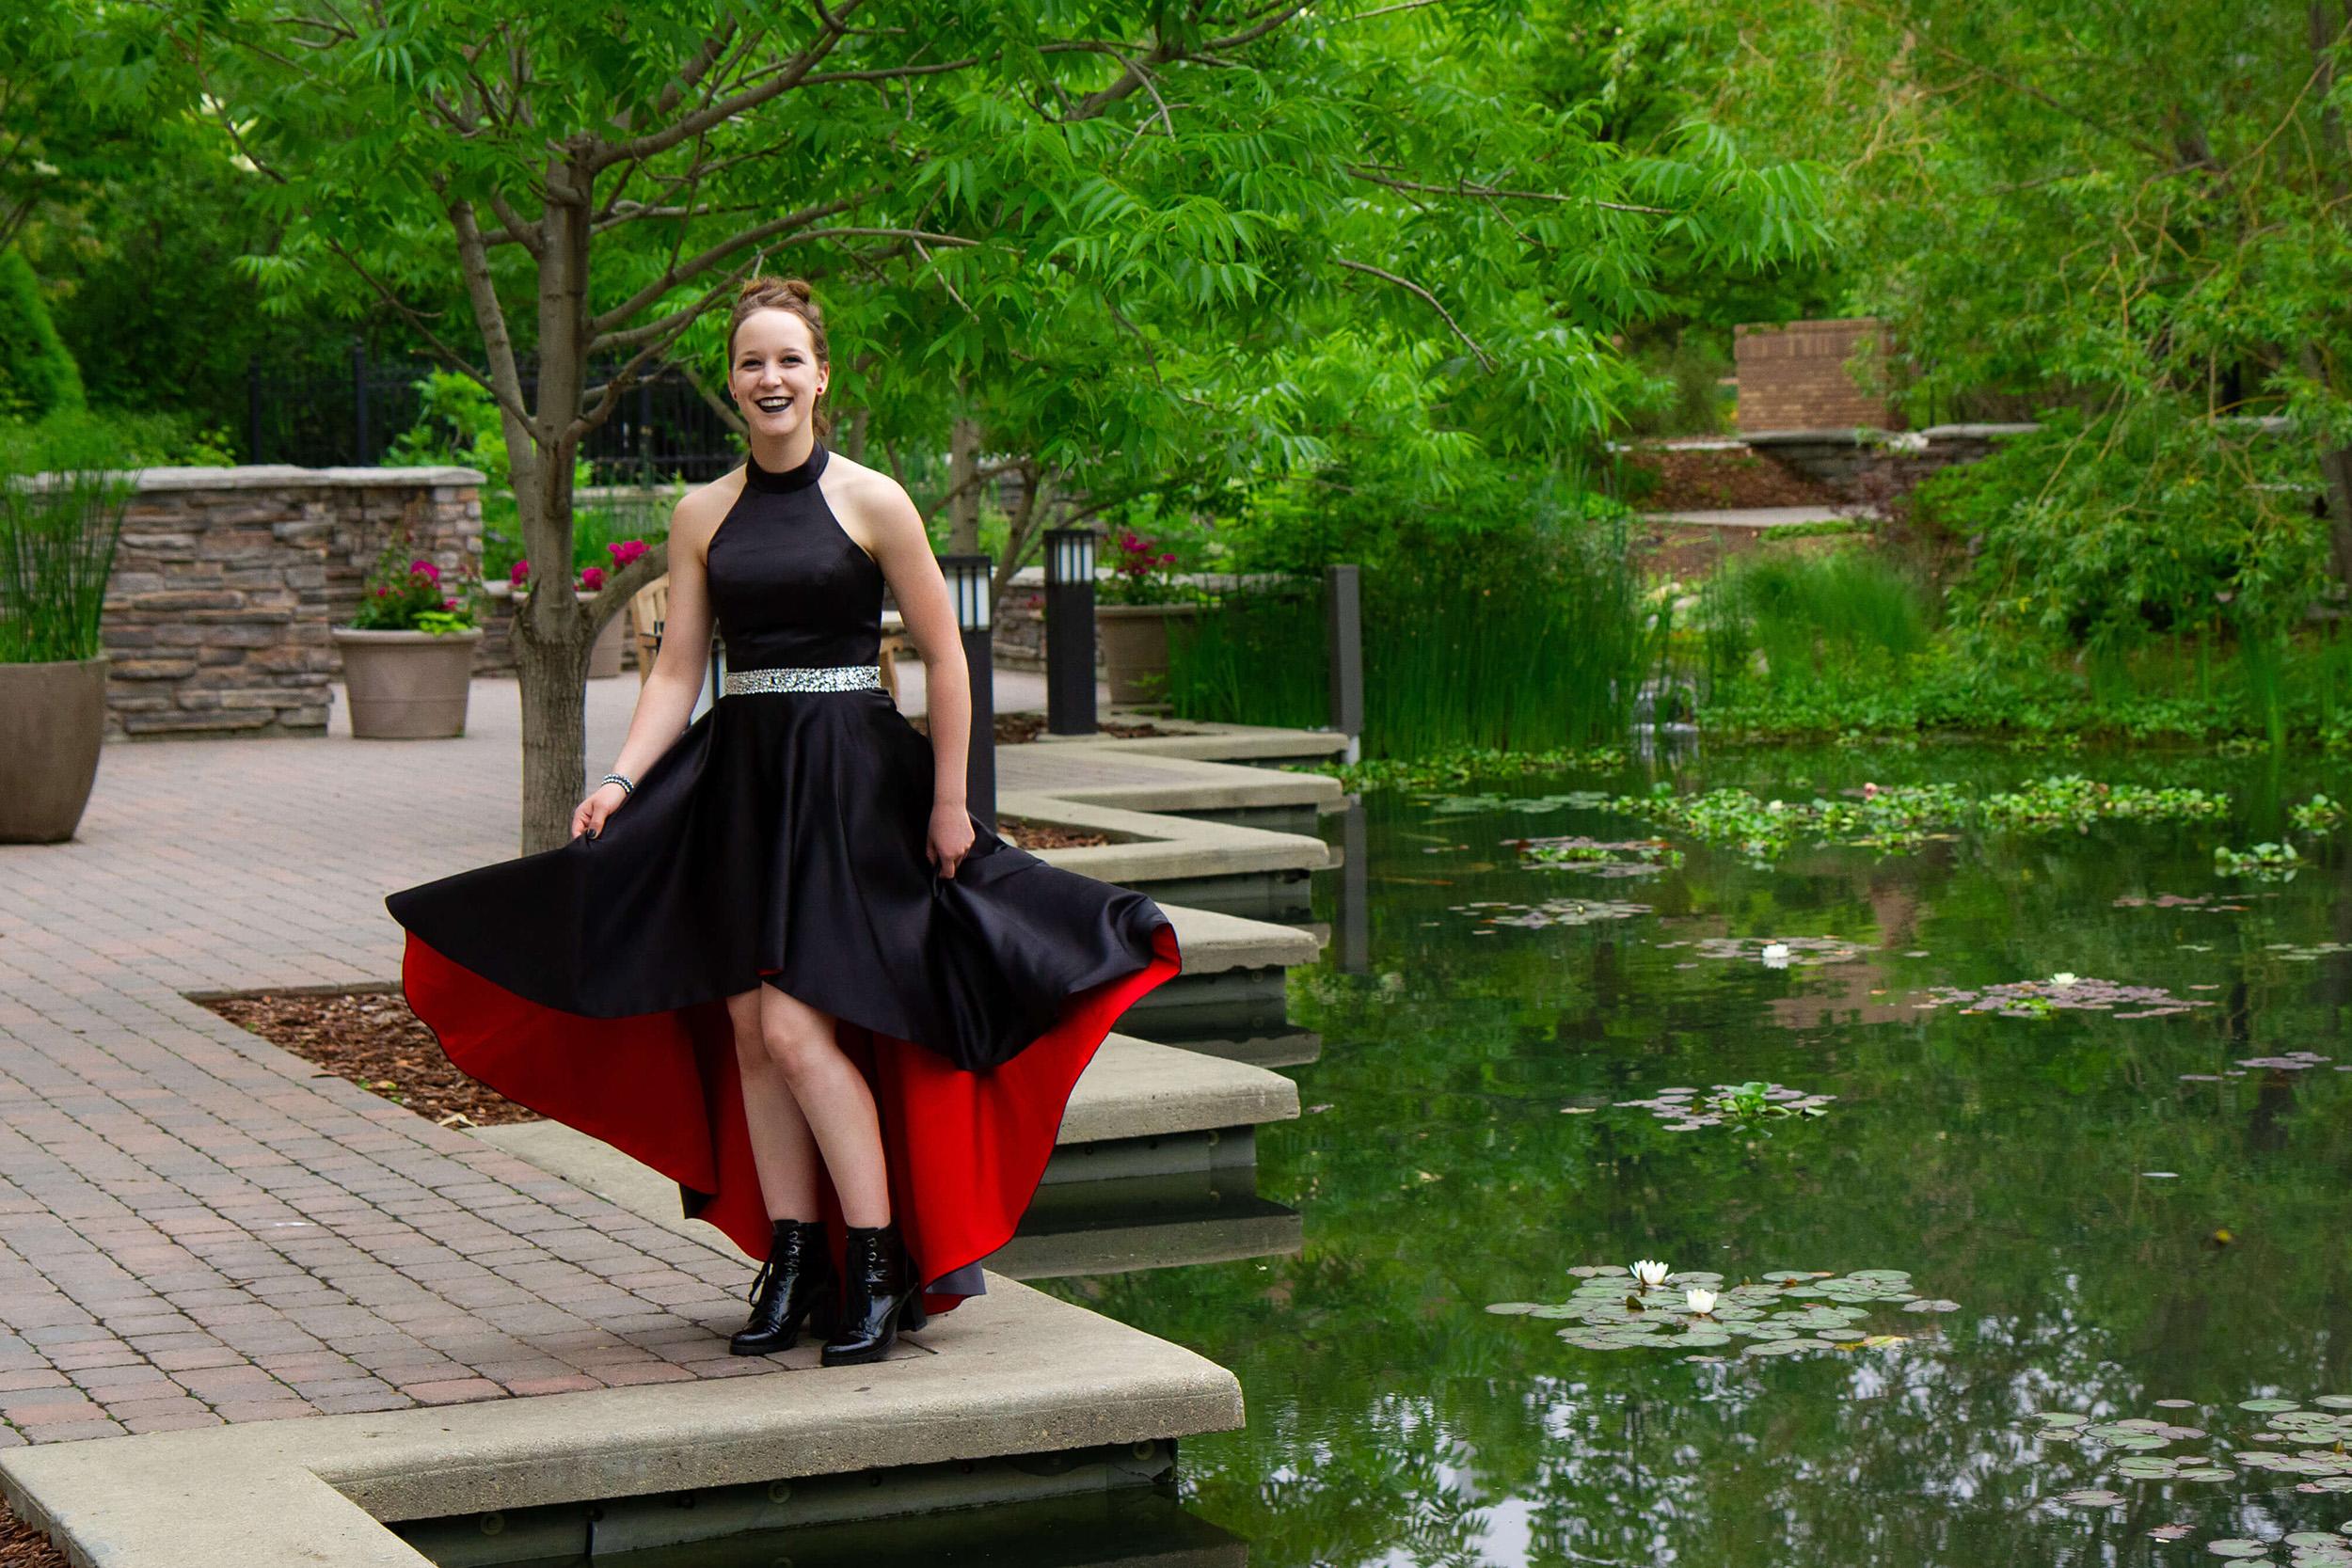 Saskatoon Formal Grad Prom female black dress Boffins Gardens